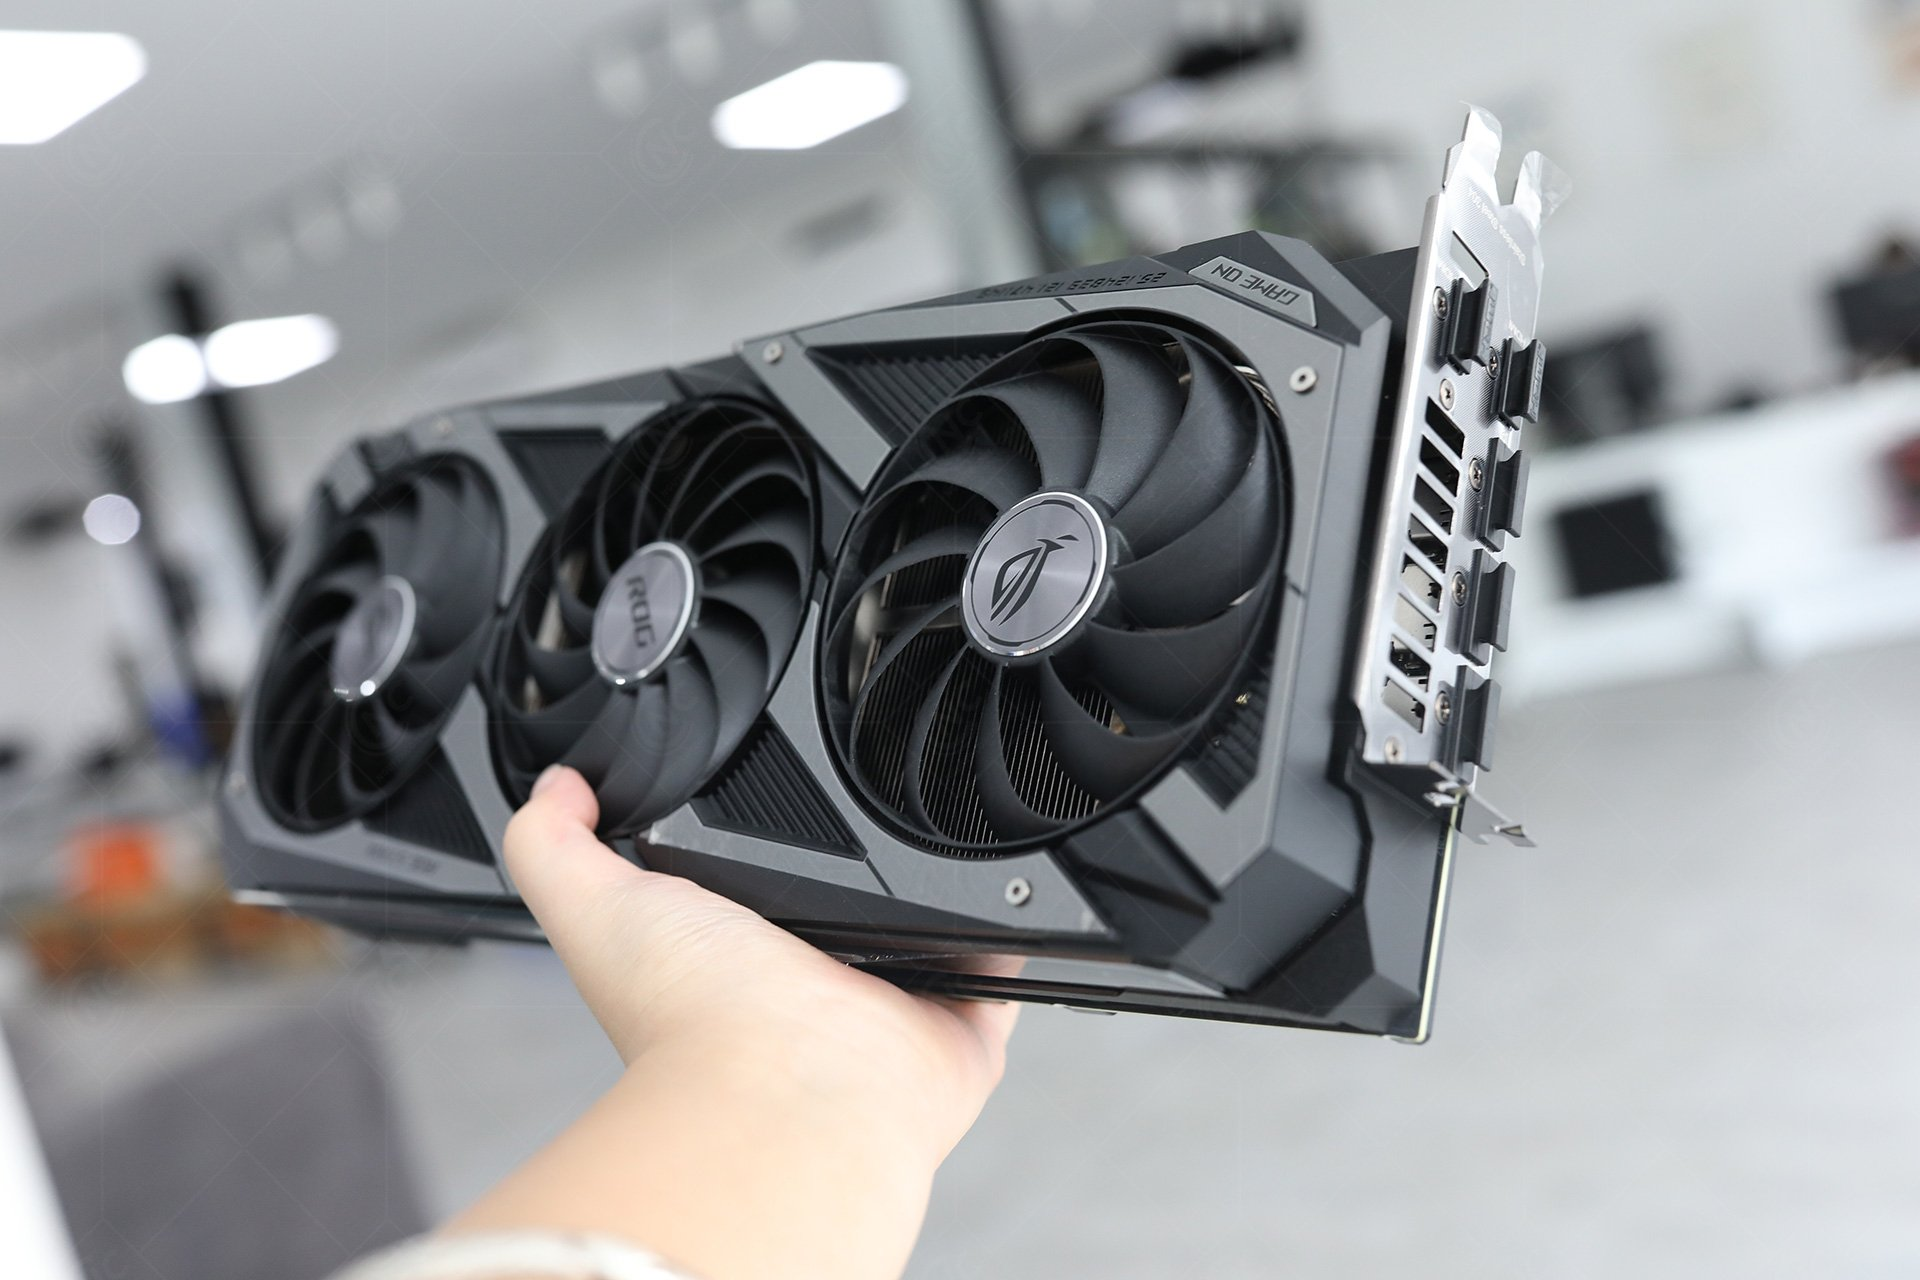 ASUS ROG STRIX GeForce RTX 3080 Ti OC